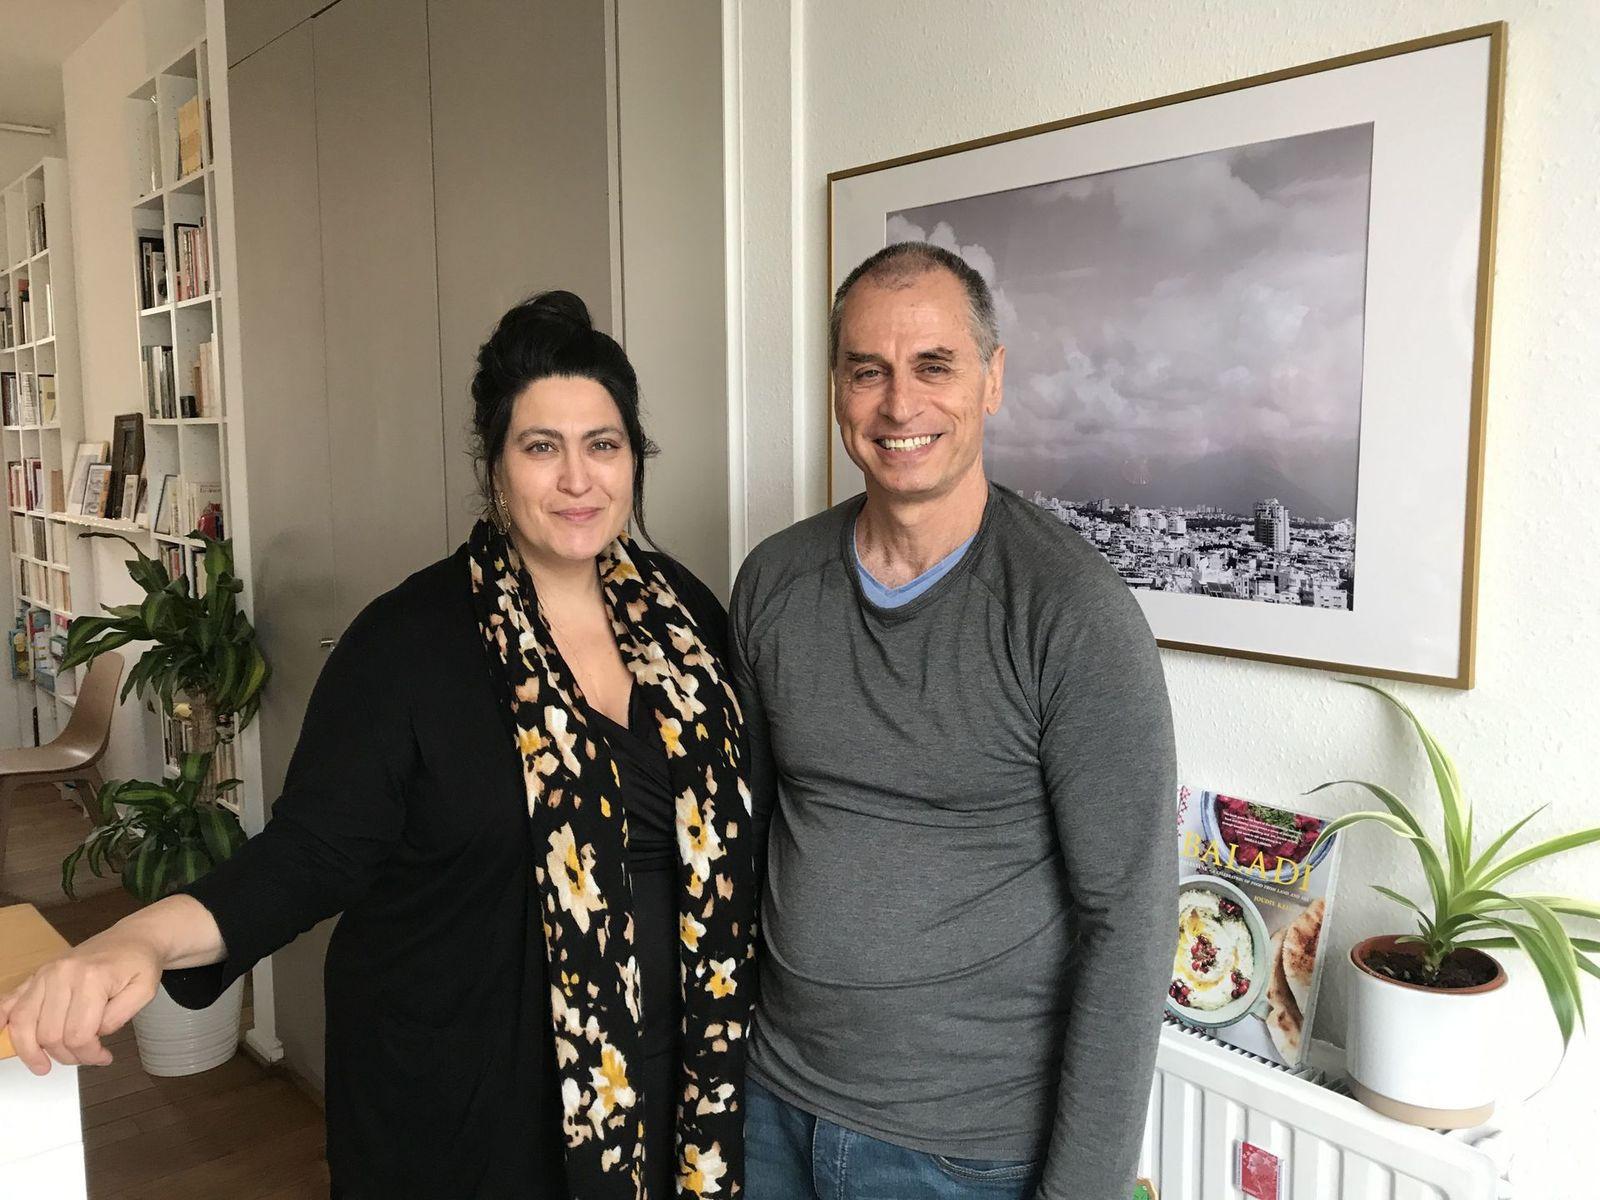 Eleonore Merza Bronstein et son compagnon Eitant Brosntein Aparicio